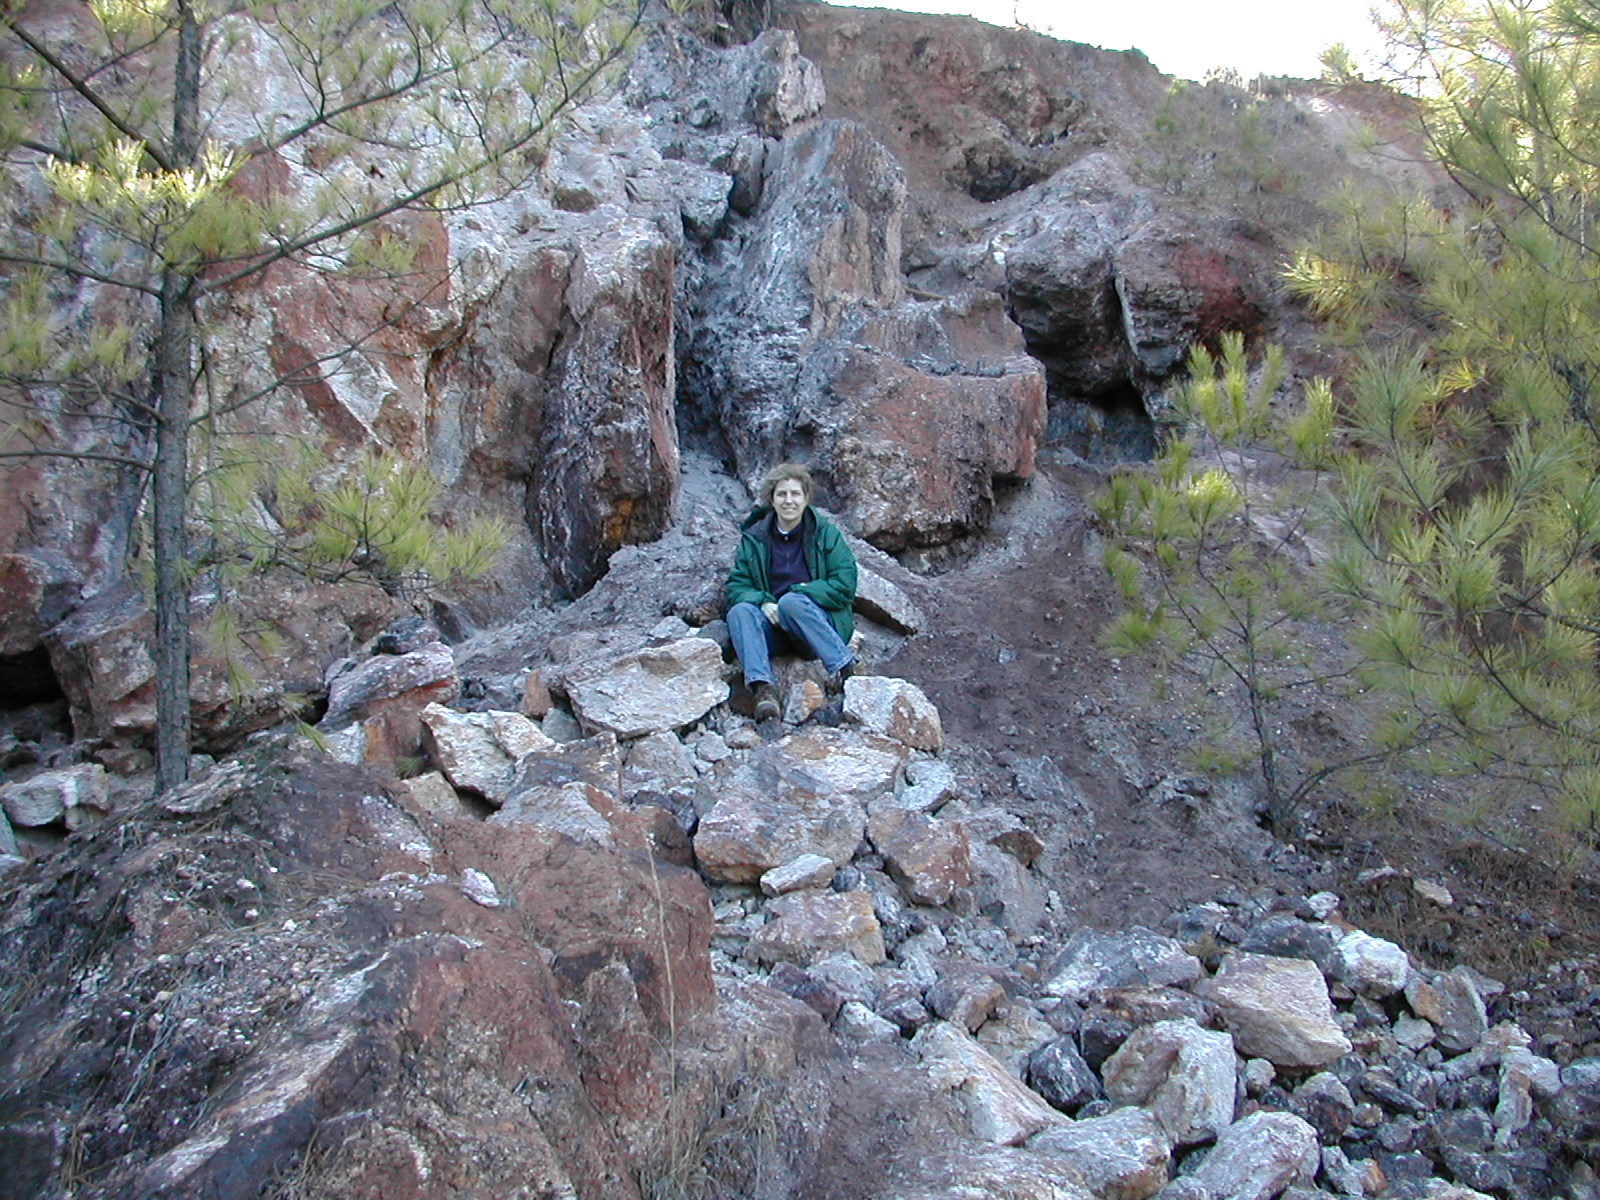 Betty on Graves Mountain, 12/14/2002